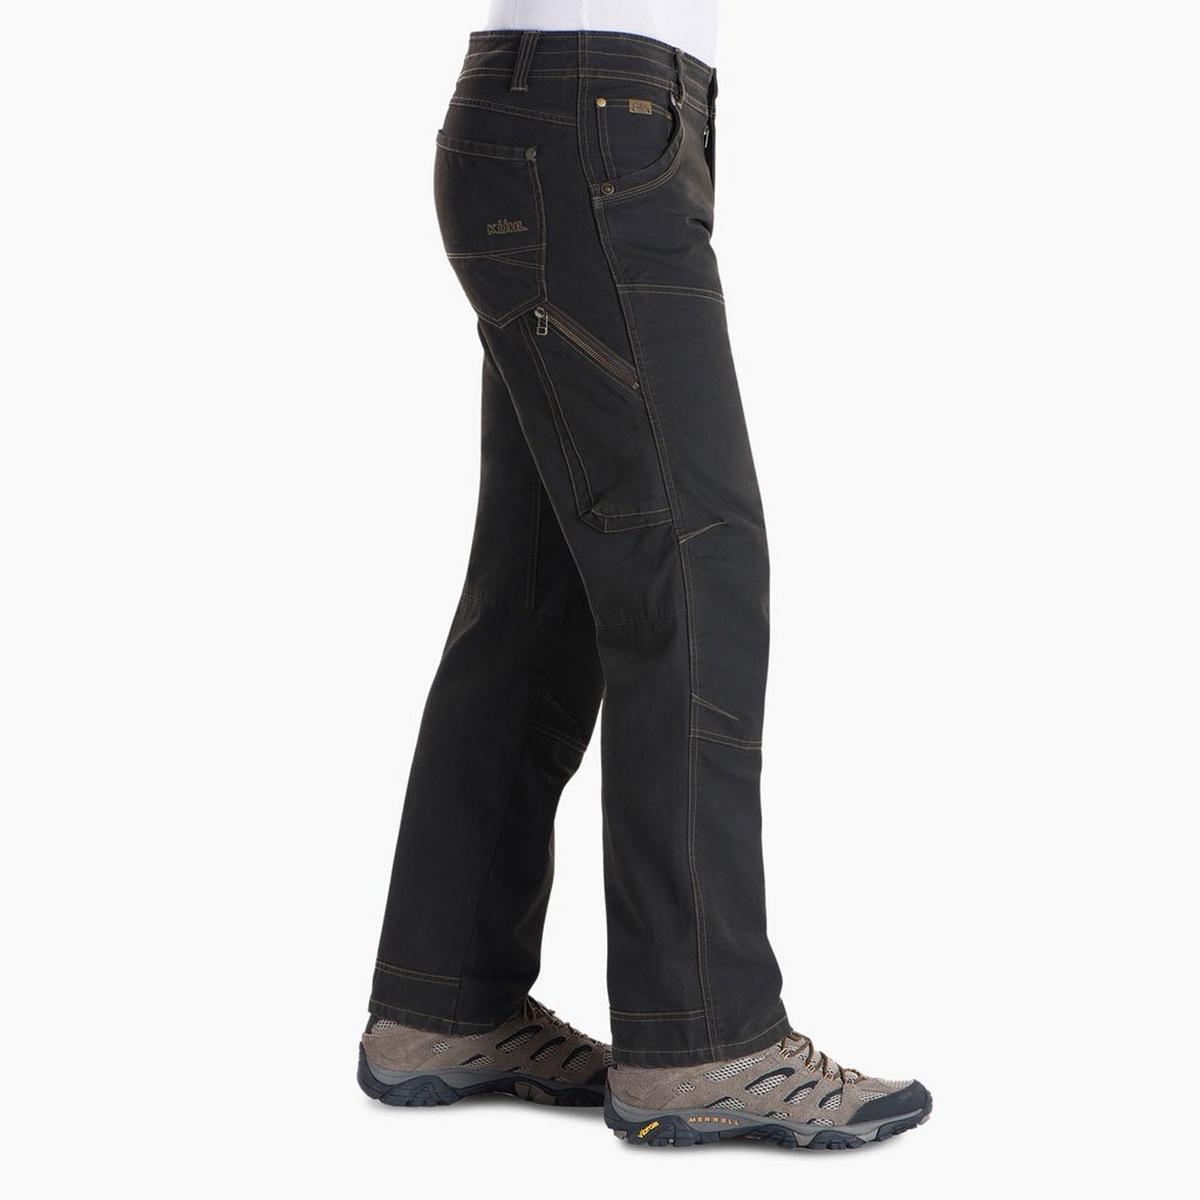 Kuhl Pants Men's The Law SHORT Leg Trousers Espresso